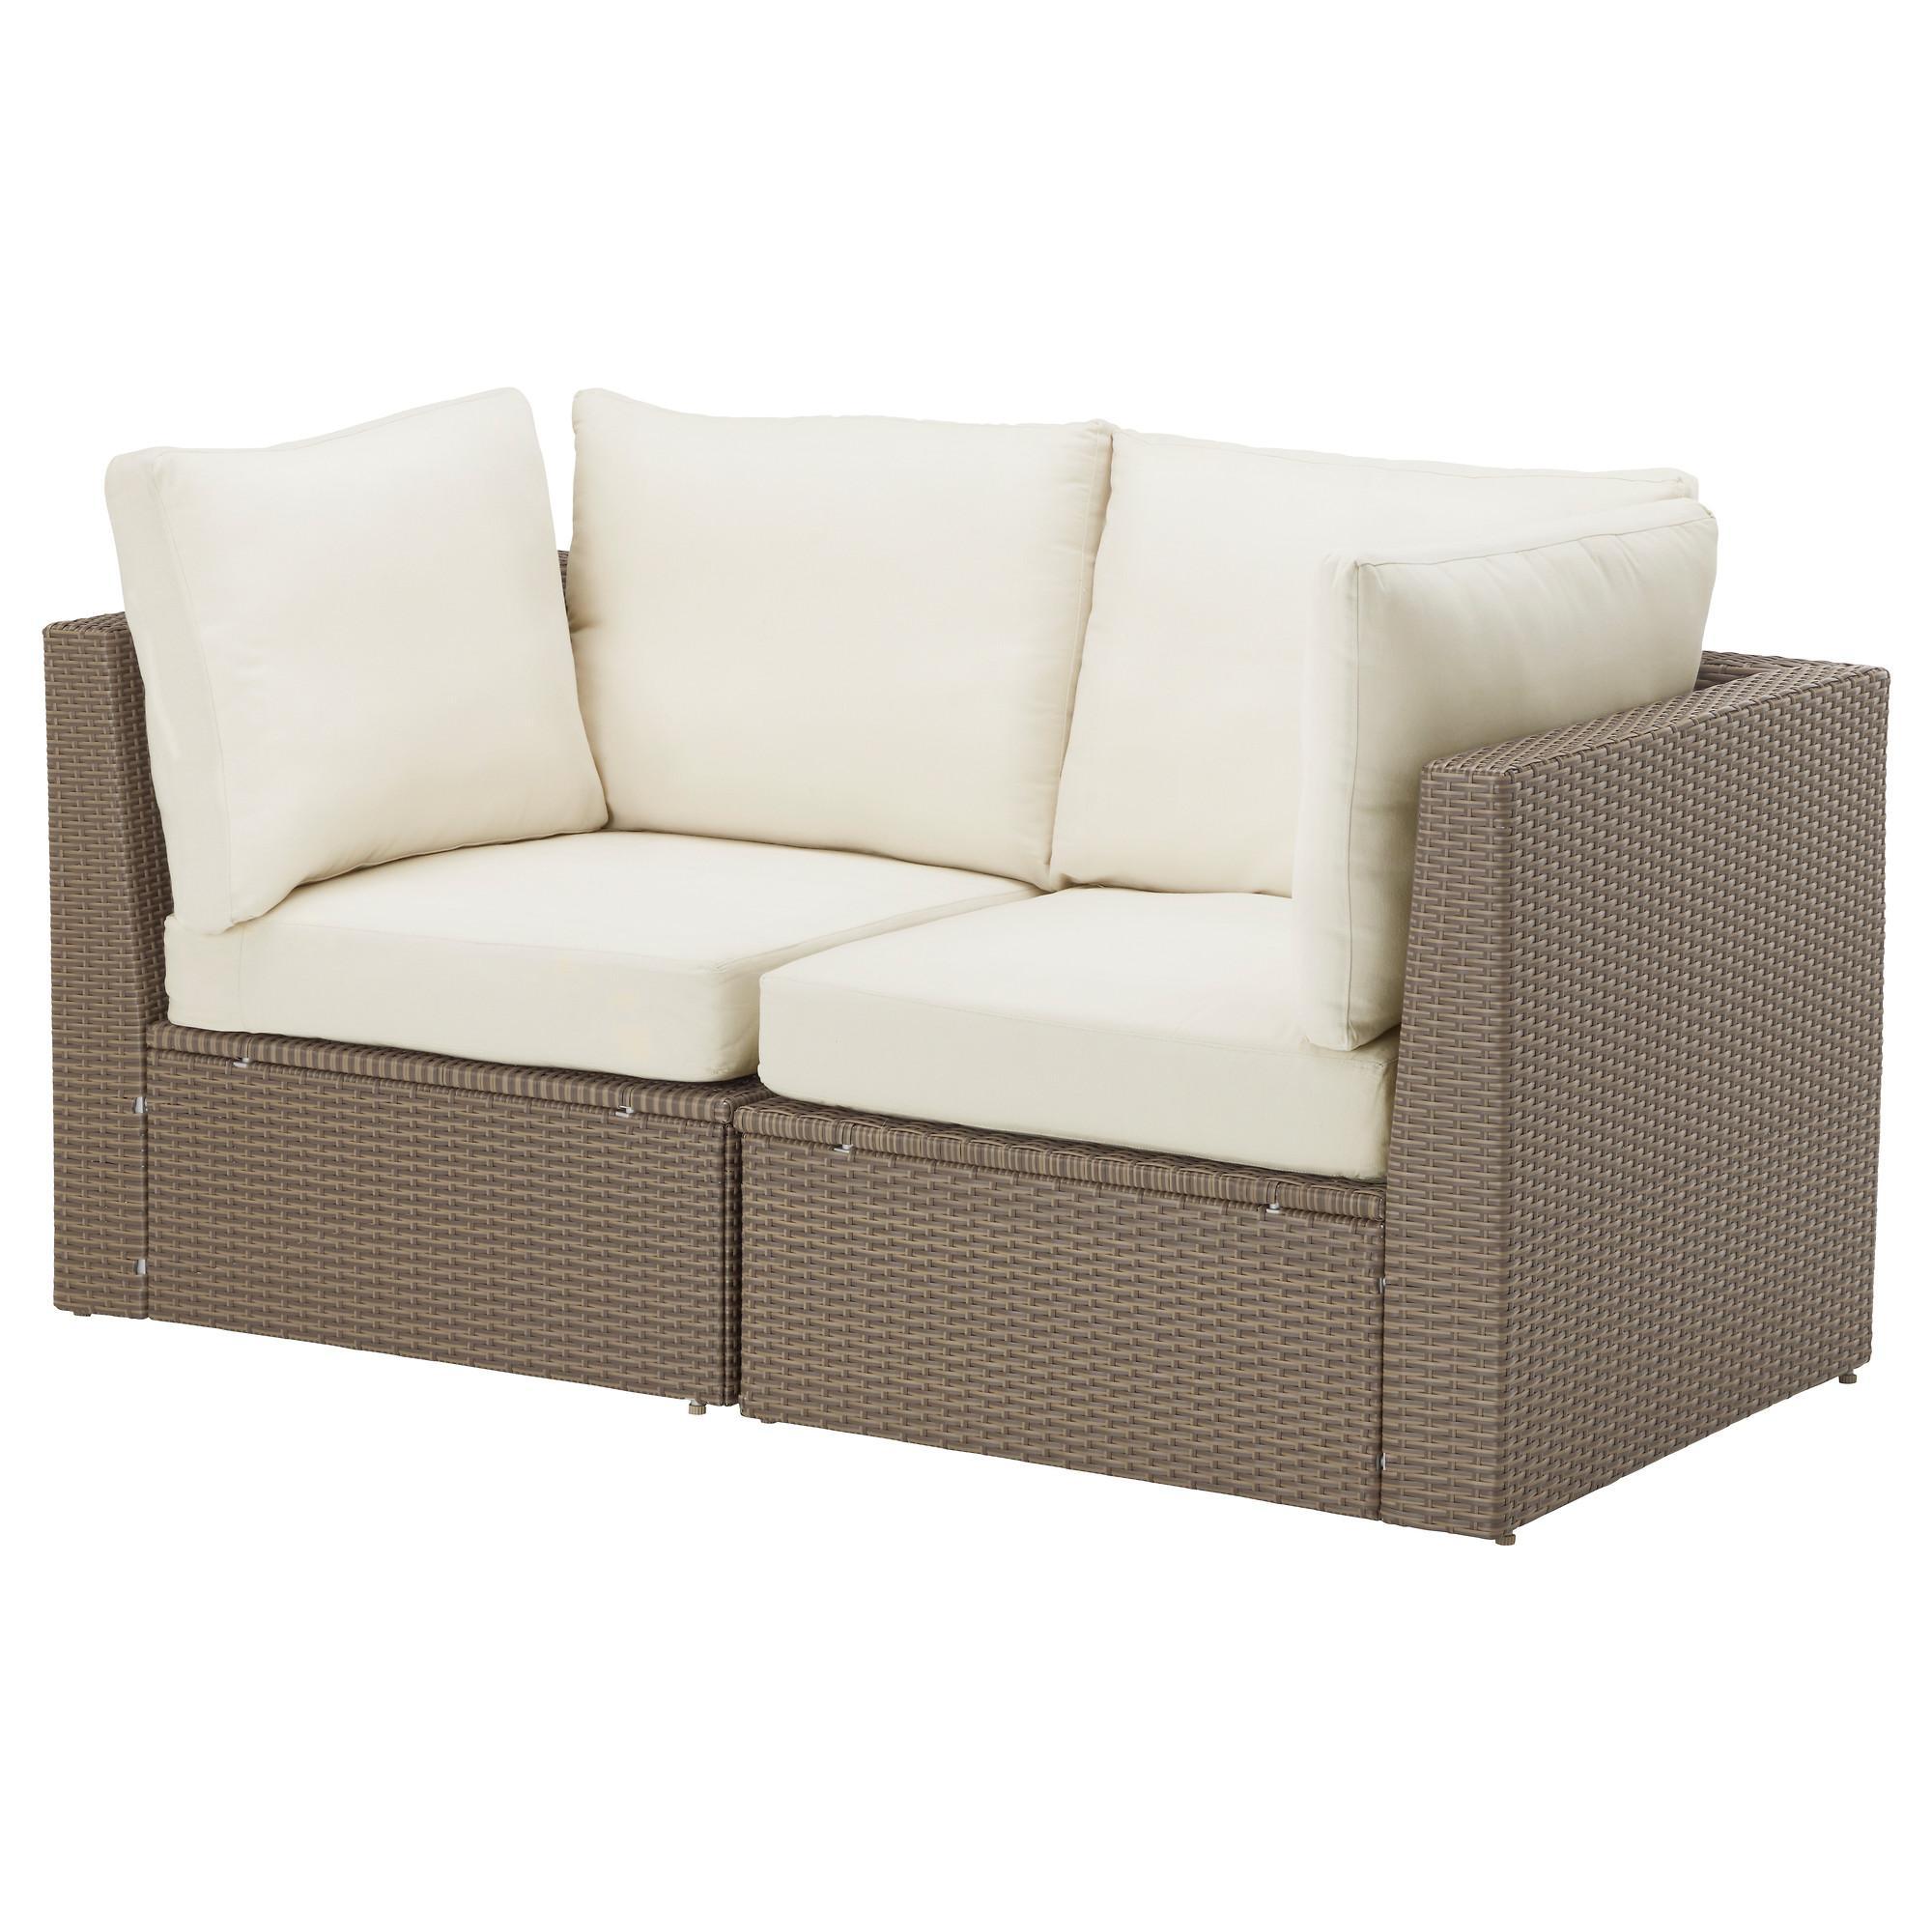 Arholma 2 Seat Sofa, Outdoor Brown/beige 152X76X66 Cm – Ikea With Sofa Chairs Ikea (View 4 of 20)